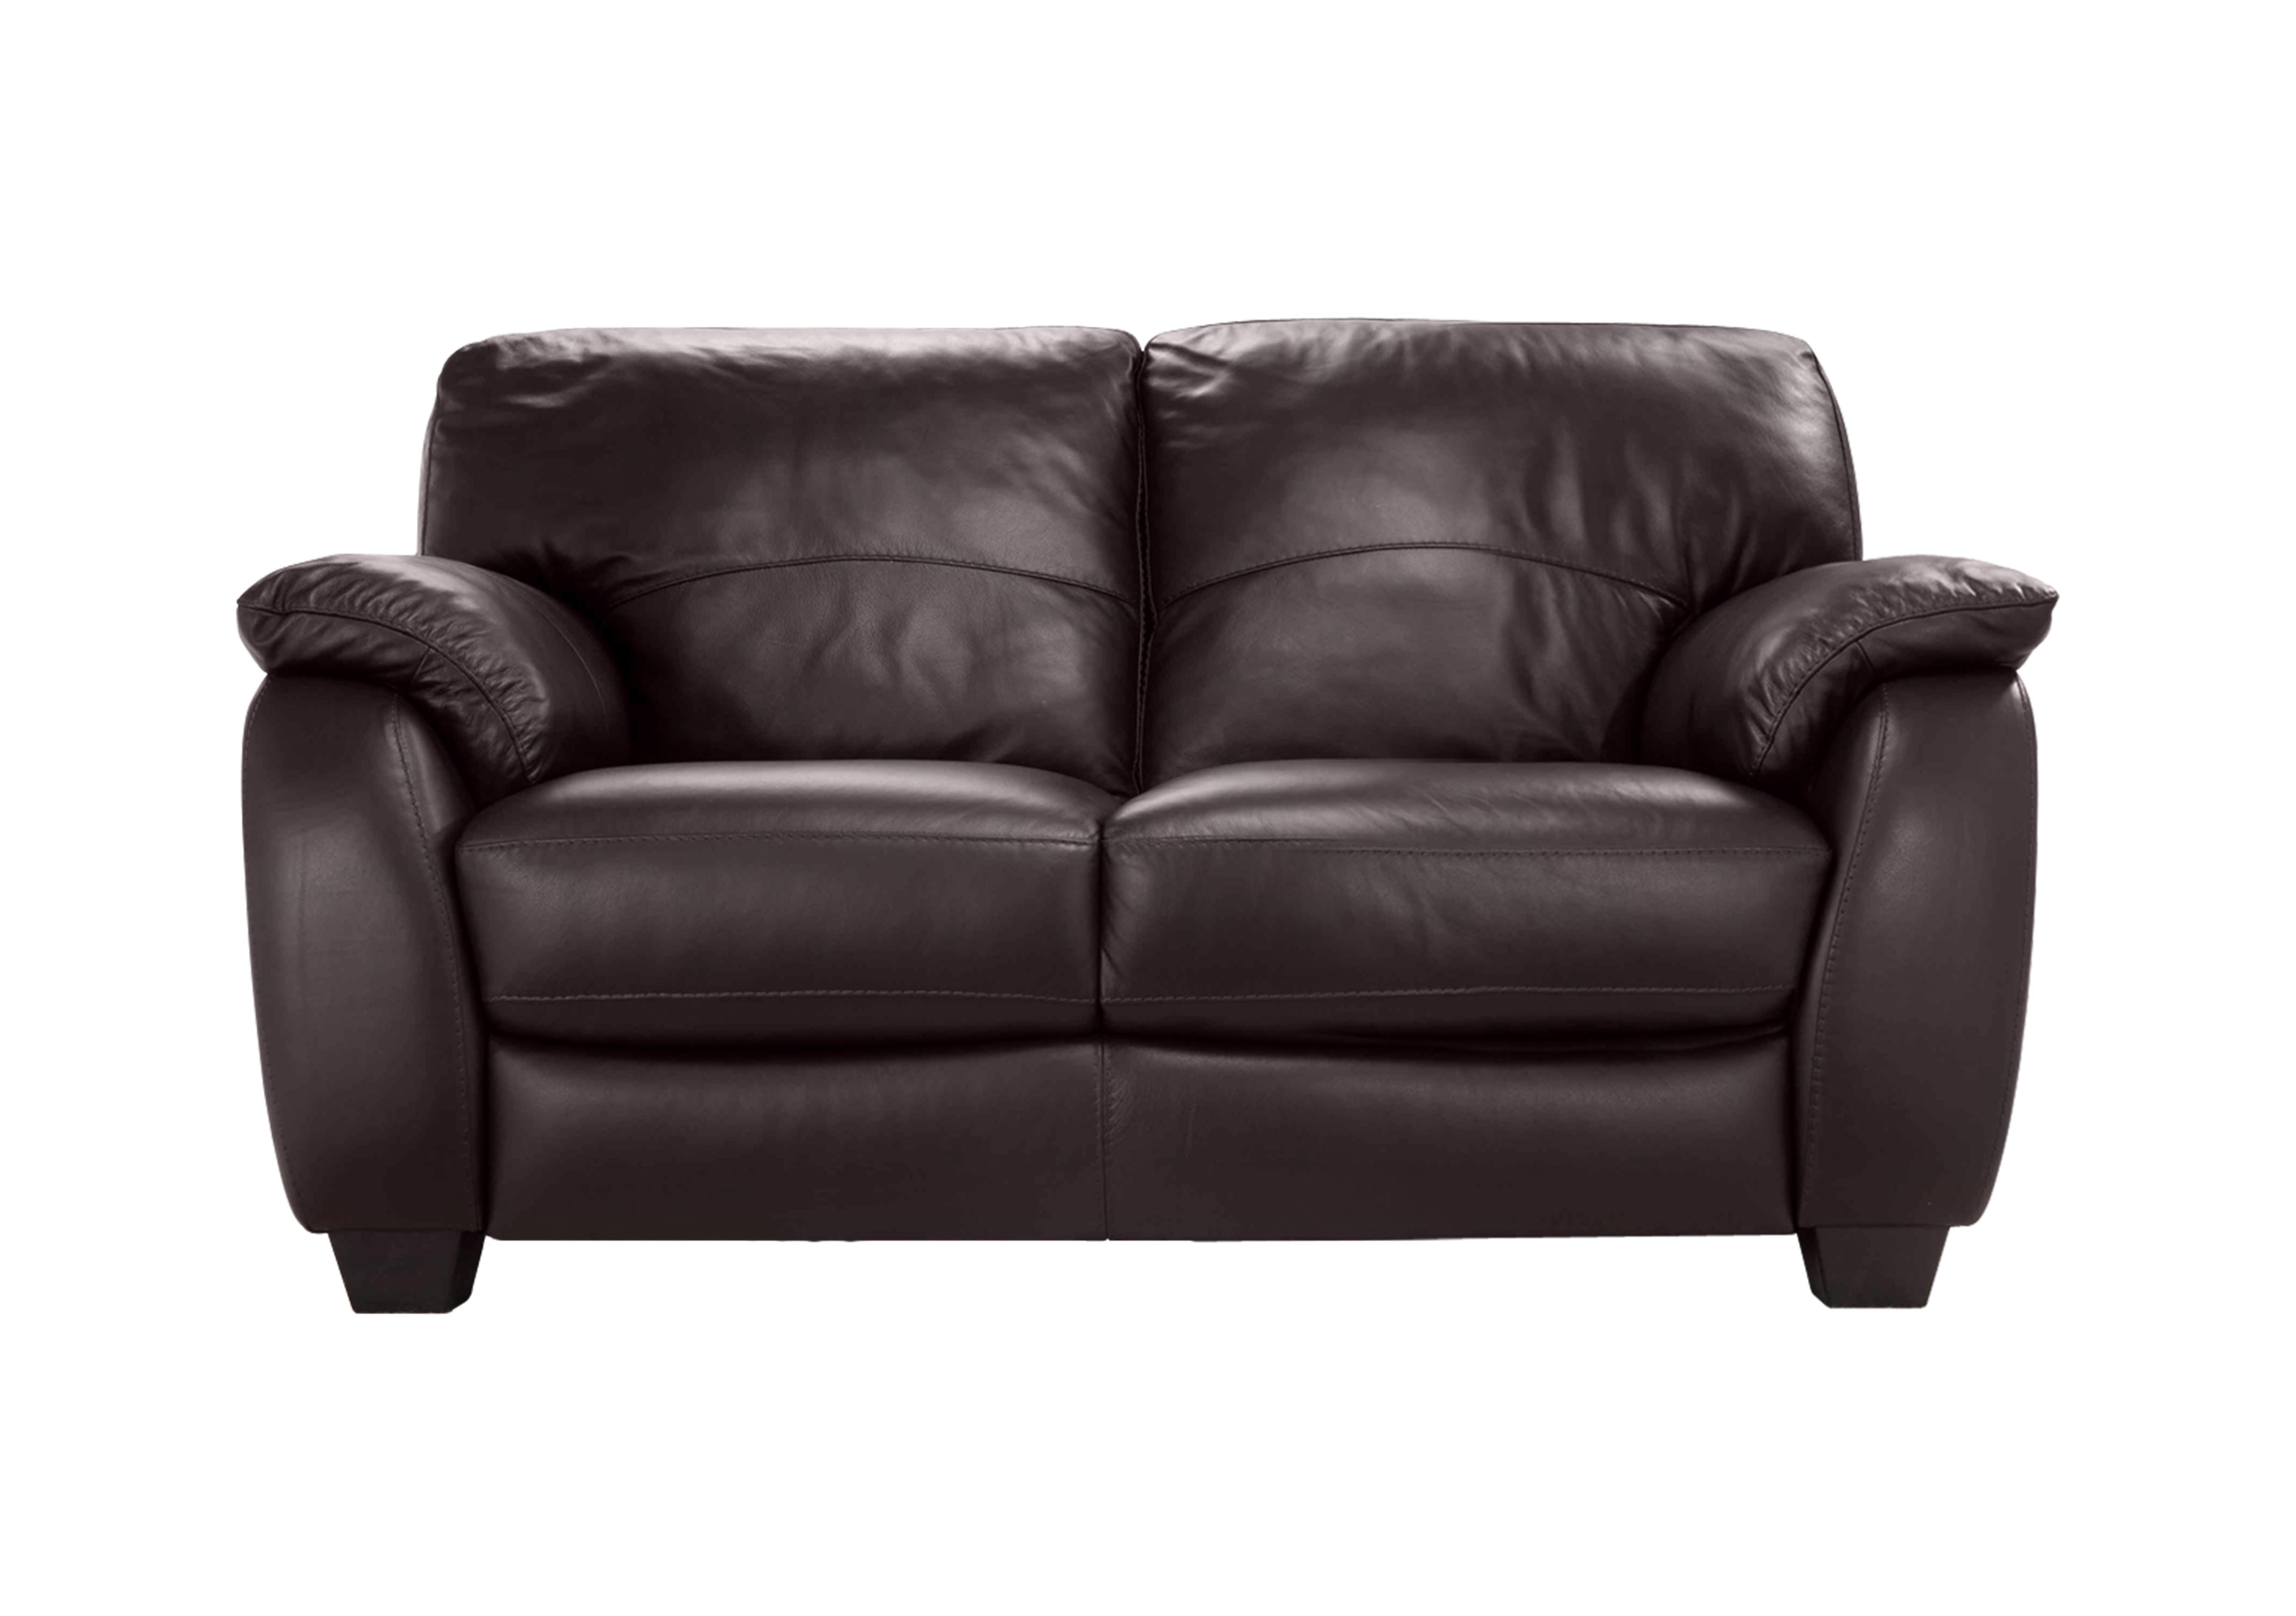 Moods 2 Seater Leather Sofa Furniture Village